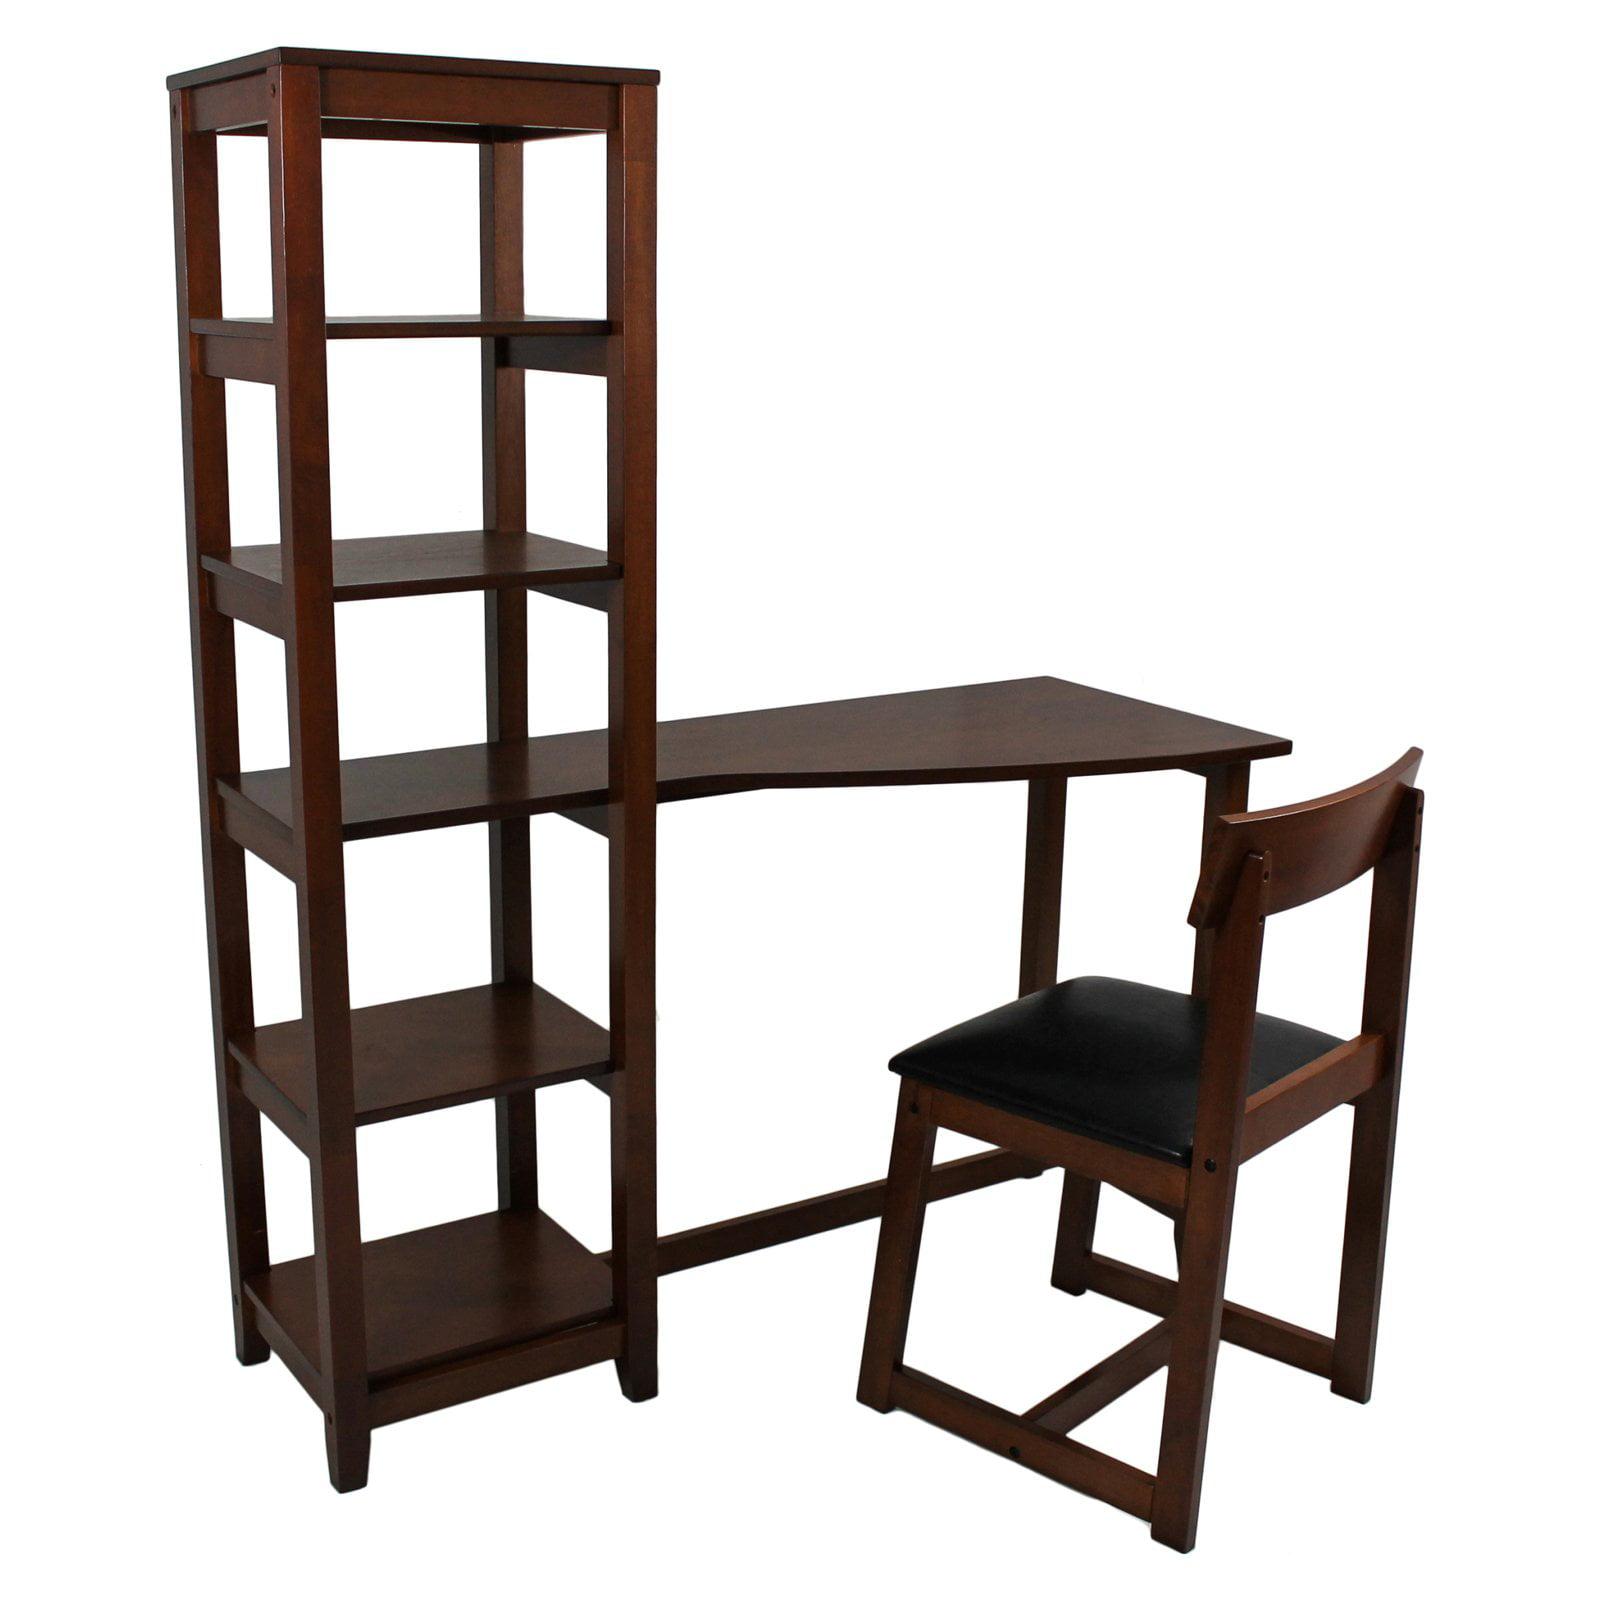 International Caravan Wallaston 2 Piece Study Desk With Attached Book Shelf And Chair Com